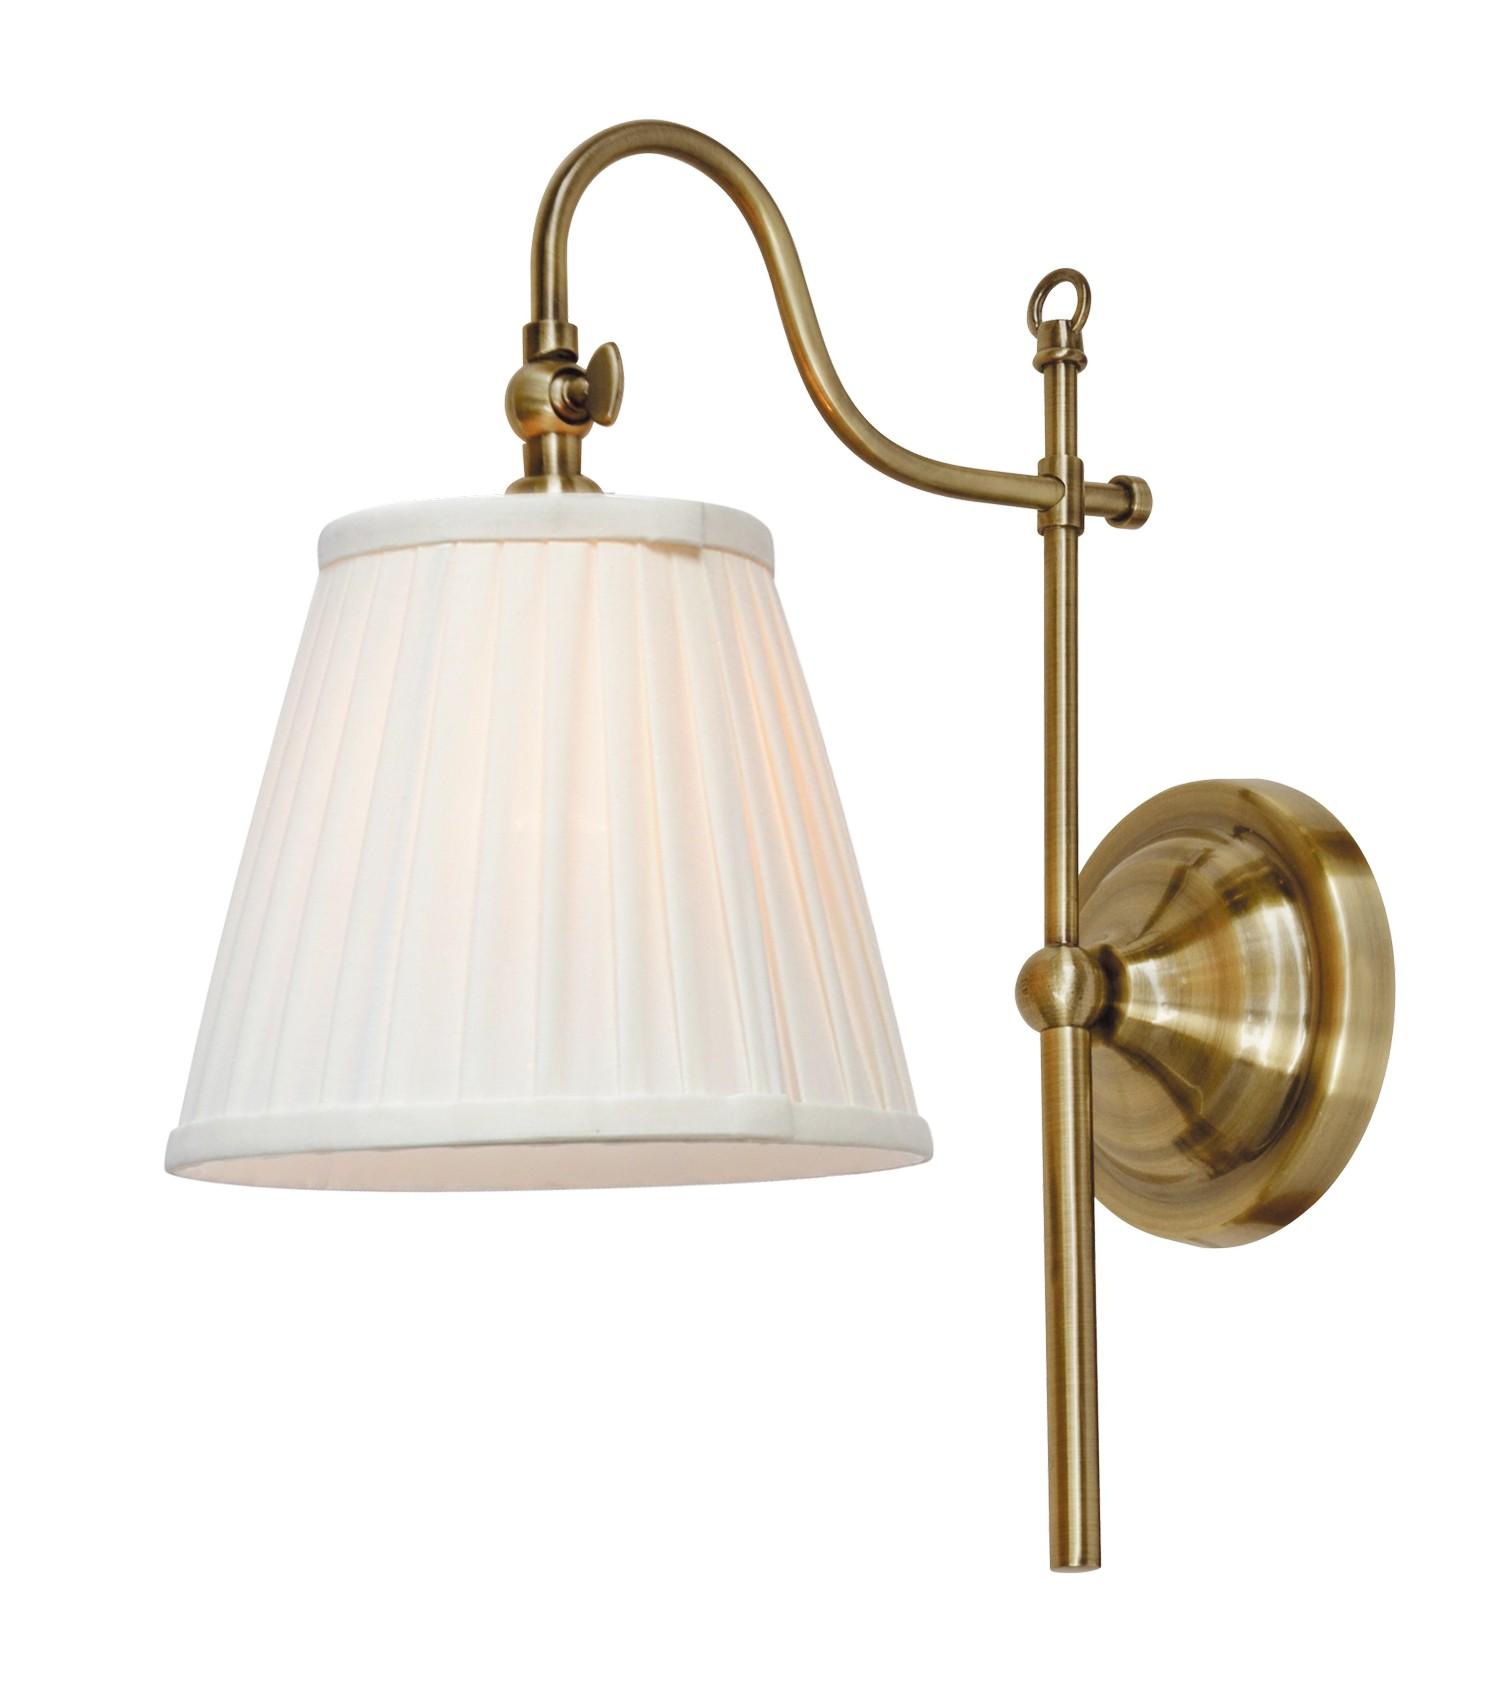 Бра Arte lamp Seville a1509ap-1pb бра 8111 01 ap 1 divinare